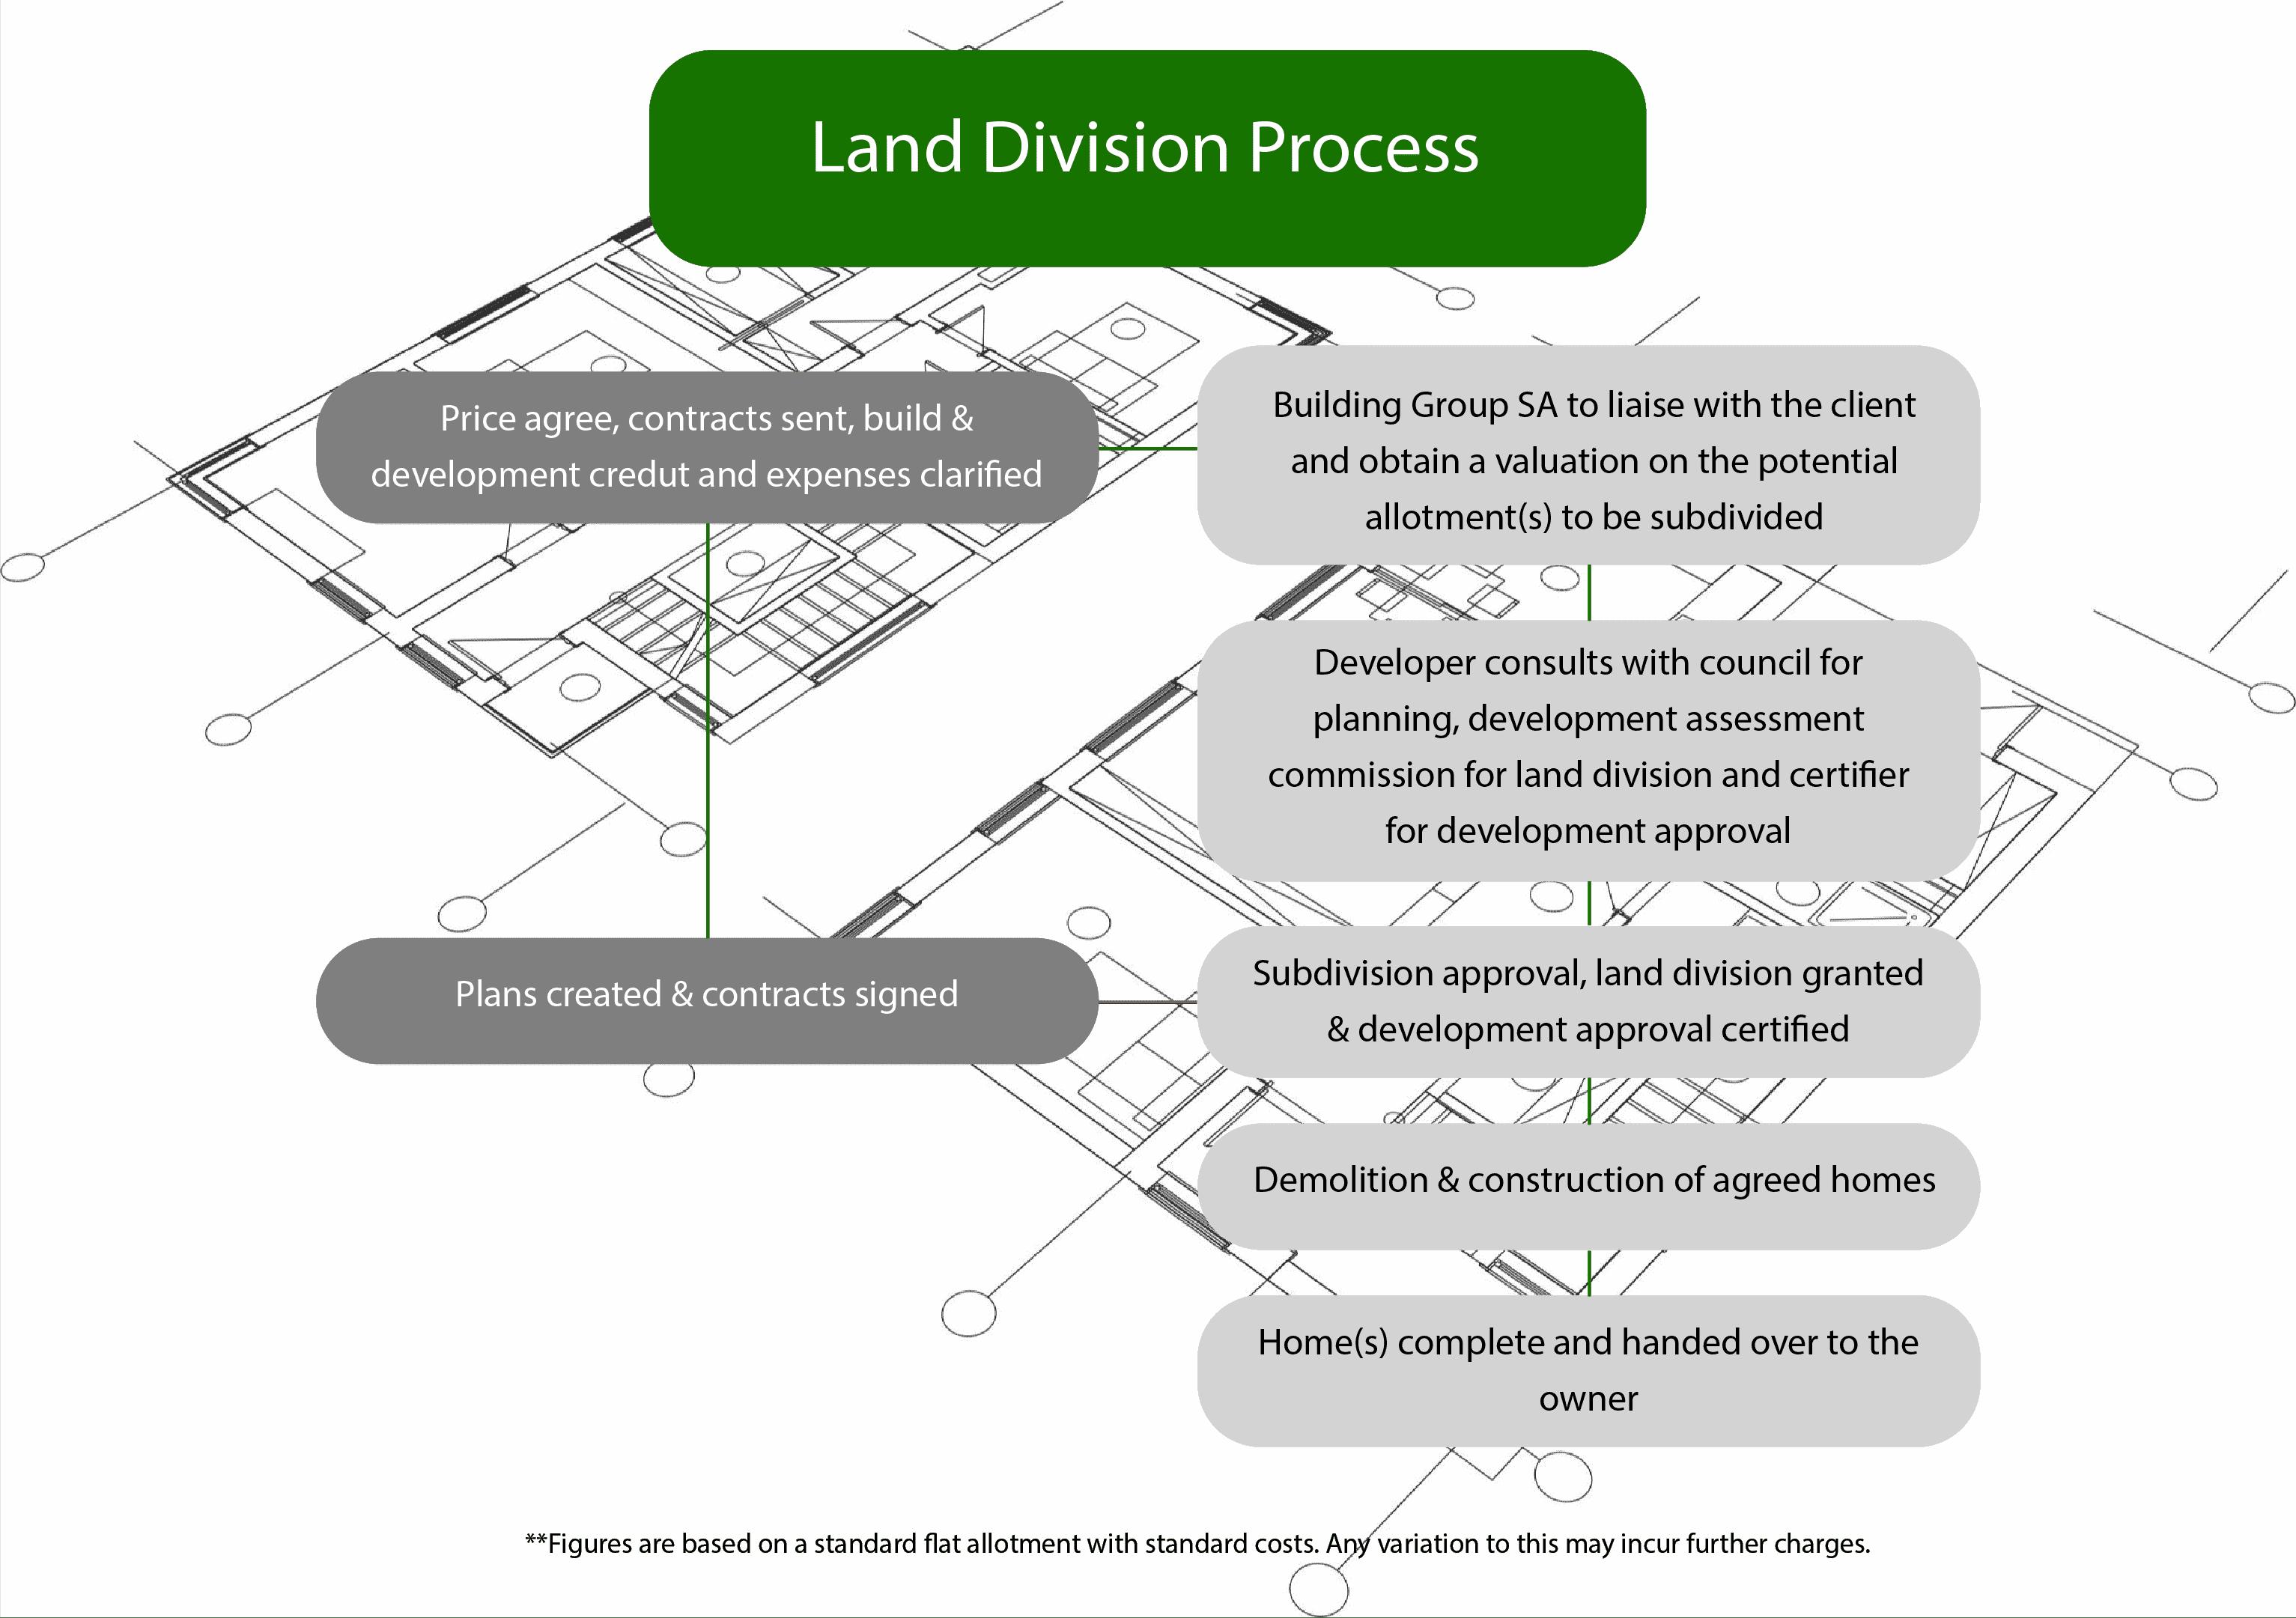 Land Division Process